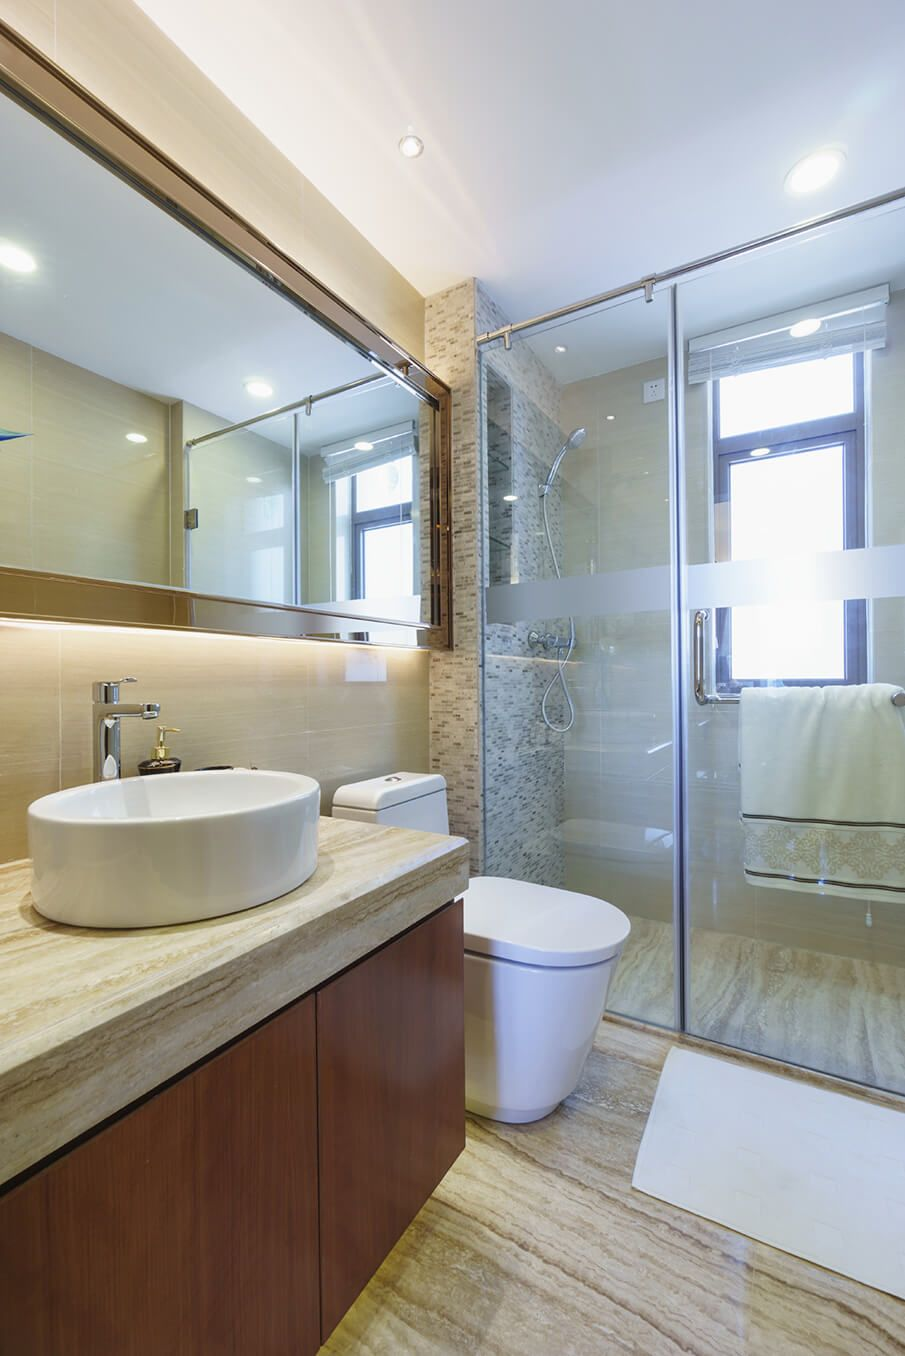 Cherry Wood Bathroom Vanity With Beige Marble Top  Bathroom Ideas Alluring Top Bathroom Designs Inspiration Design